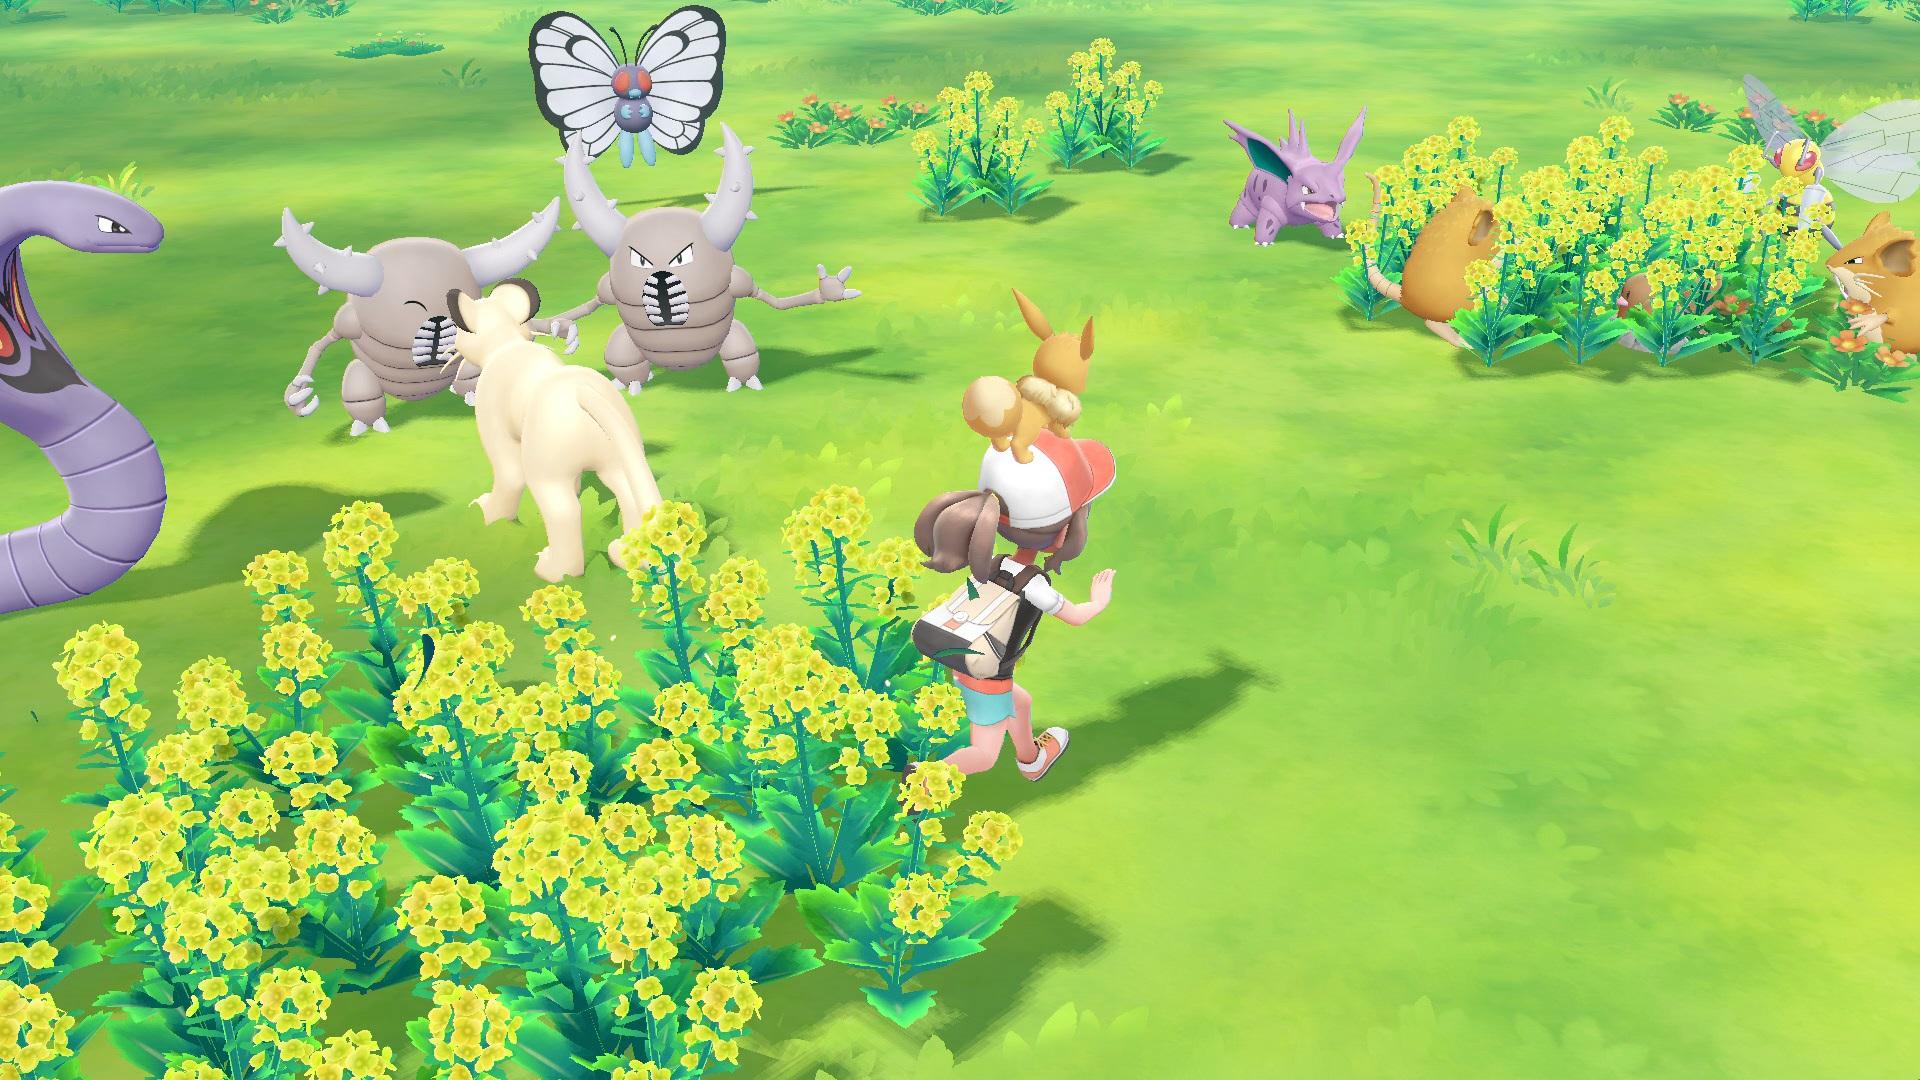 pokemon lets go pikachu and lets go eevee details